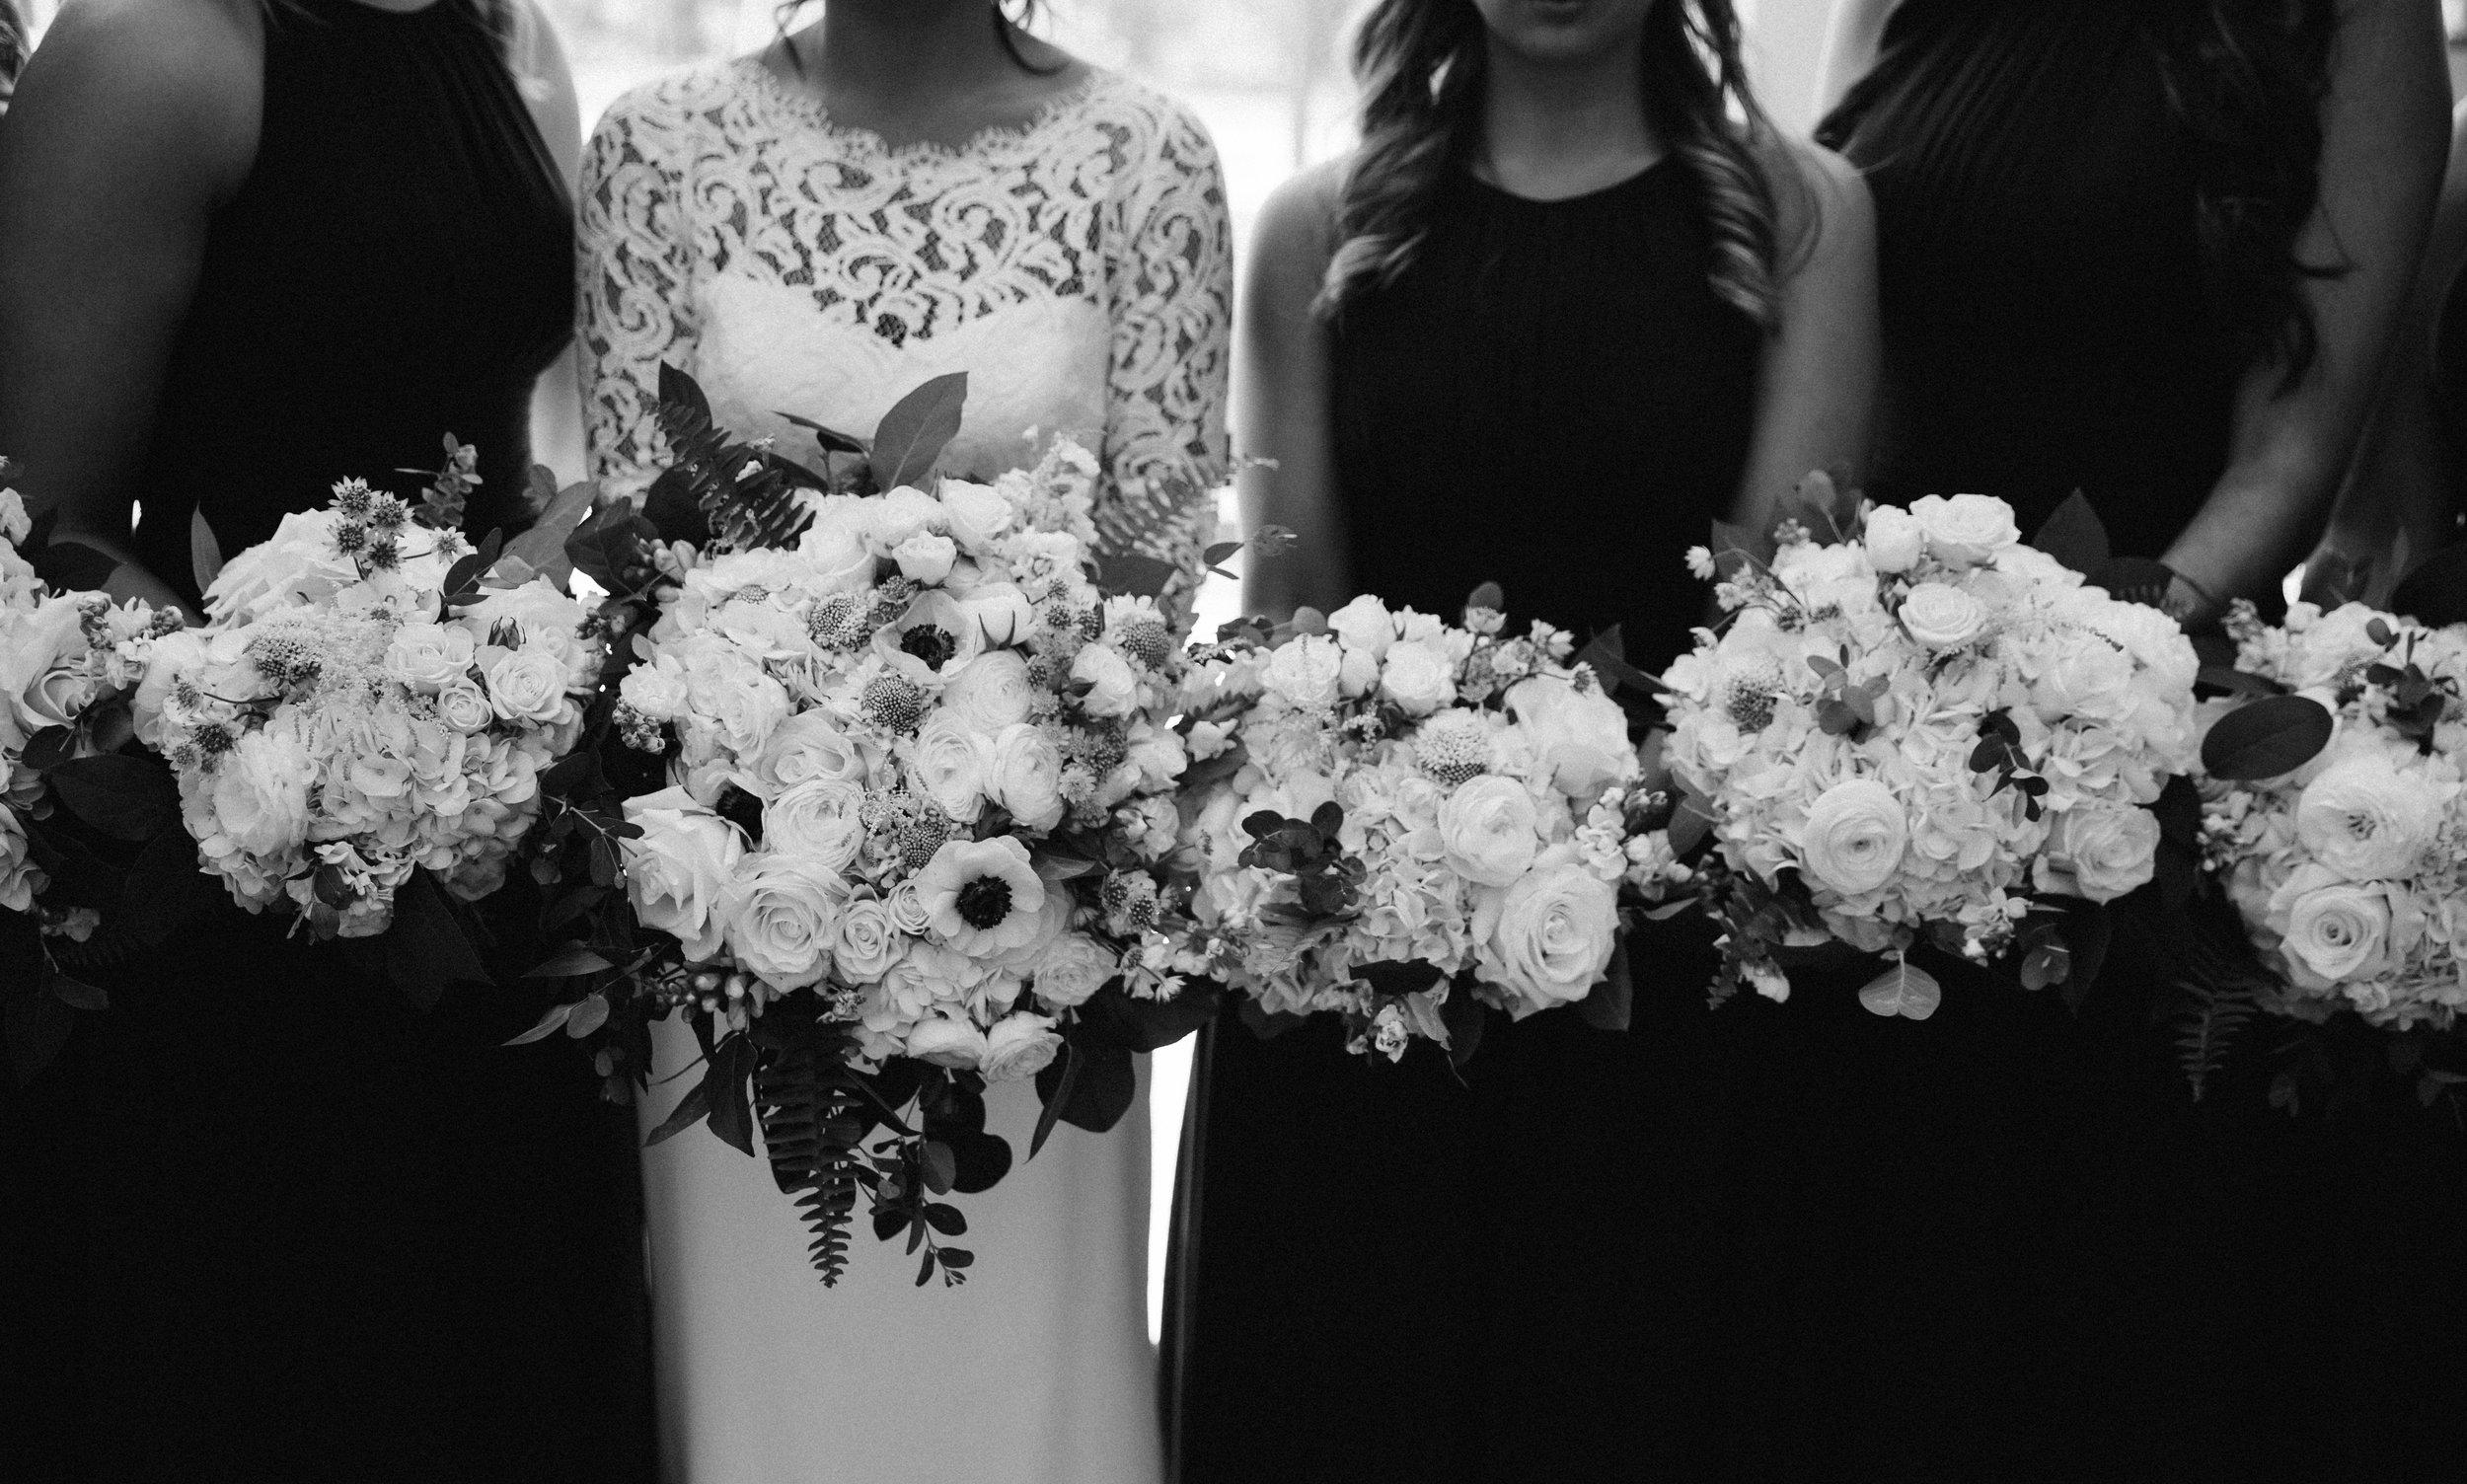 KateAlexWedding+Bridesmaids-0031.jpg